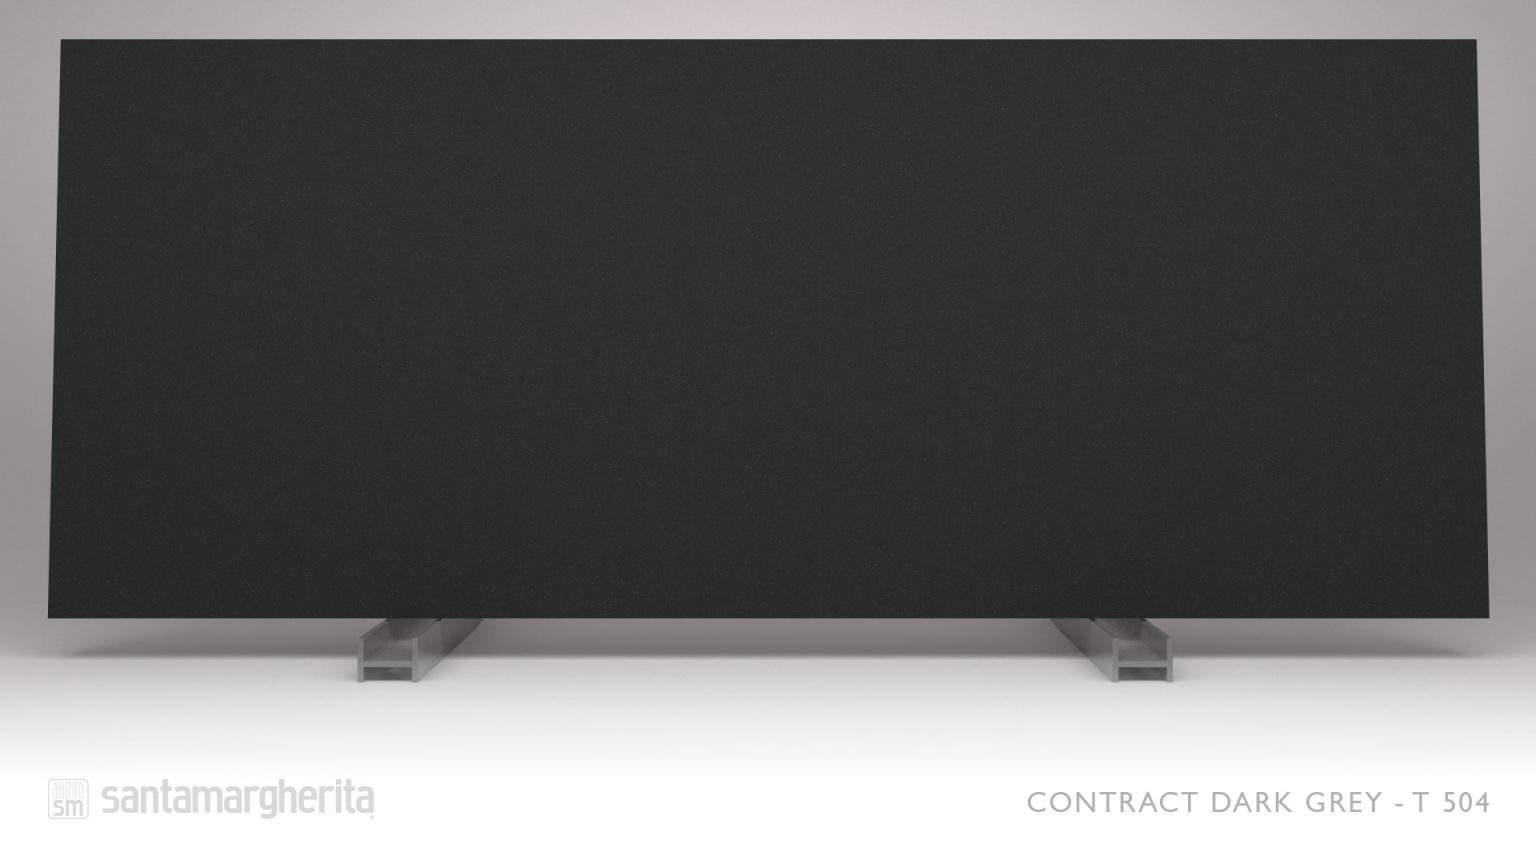 Contract Dark Grey SLAB